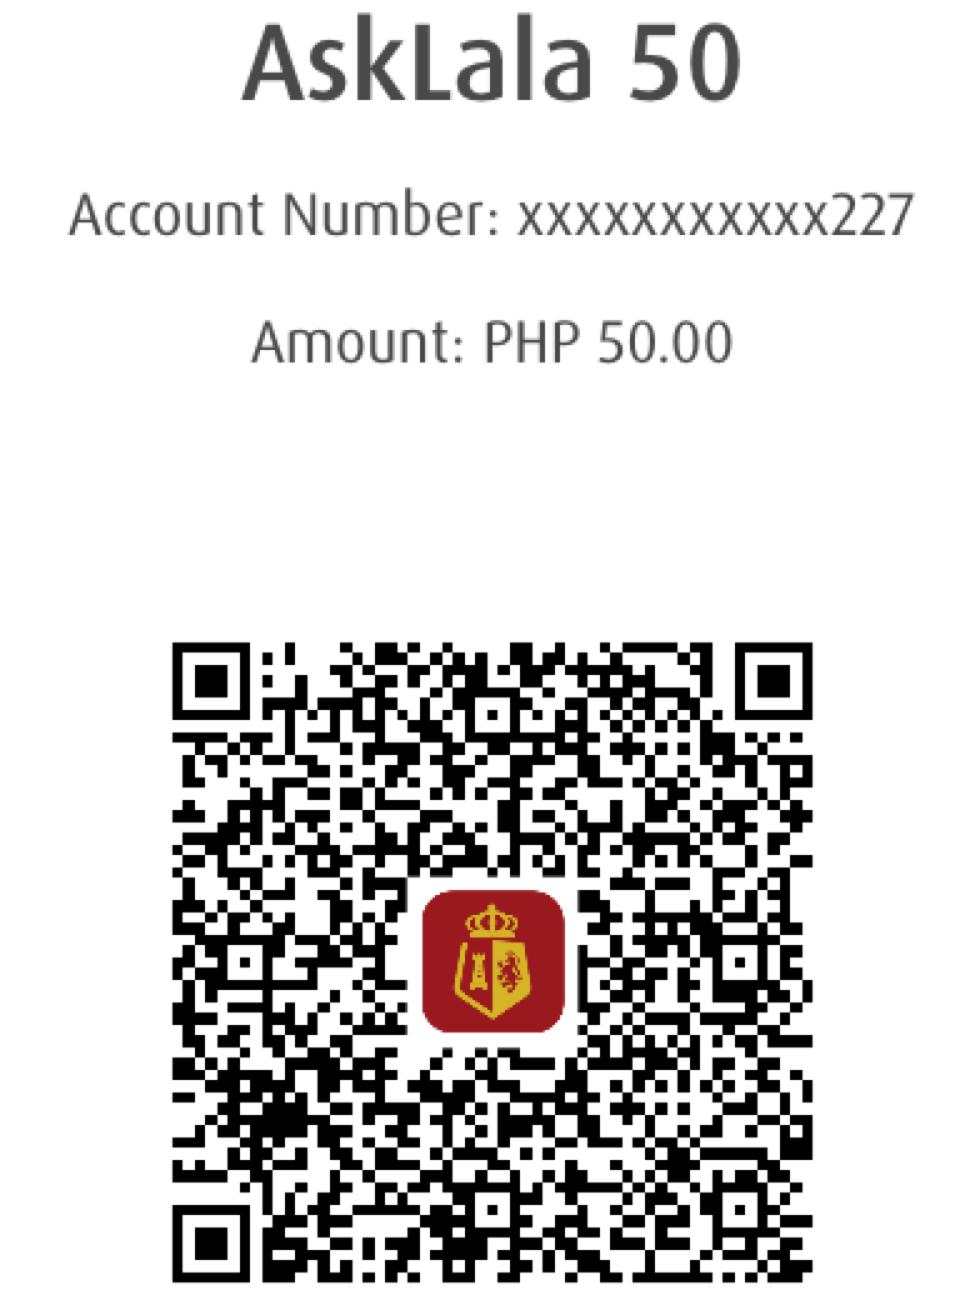 Payment Details (BPI)